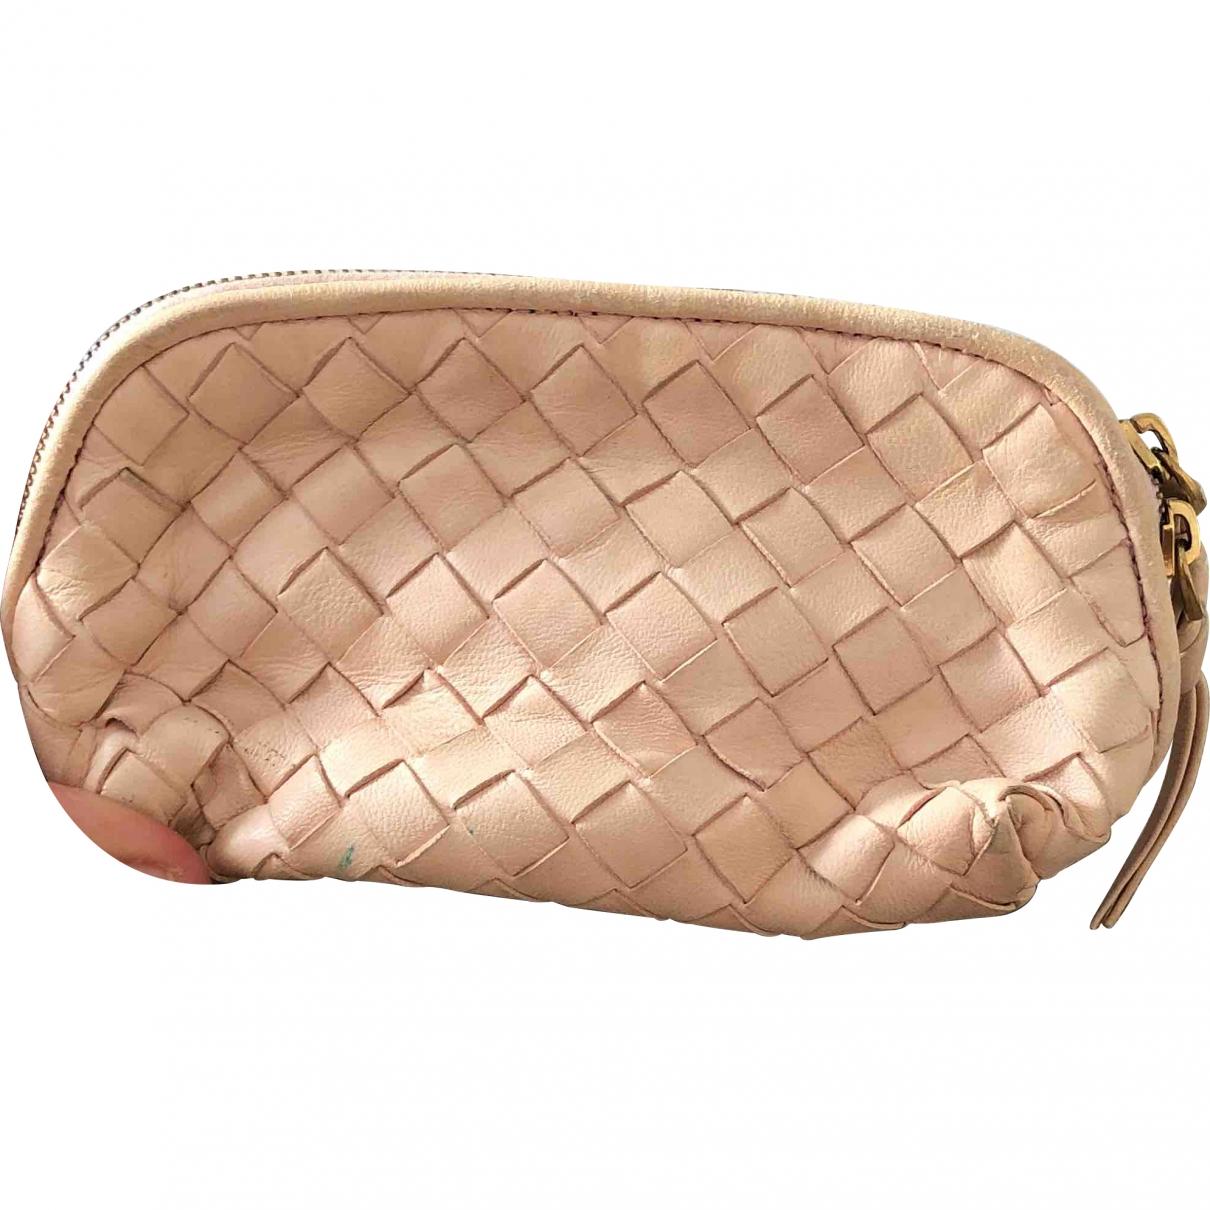 Bottega Veneta \N Pink Leather Purses, wallet & cases for Women \N